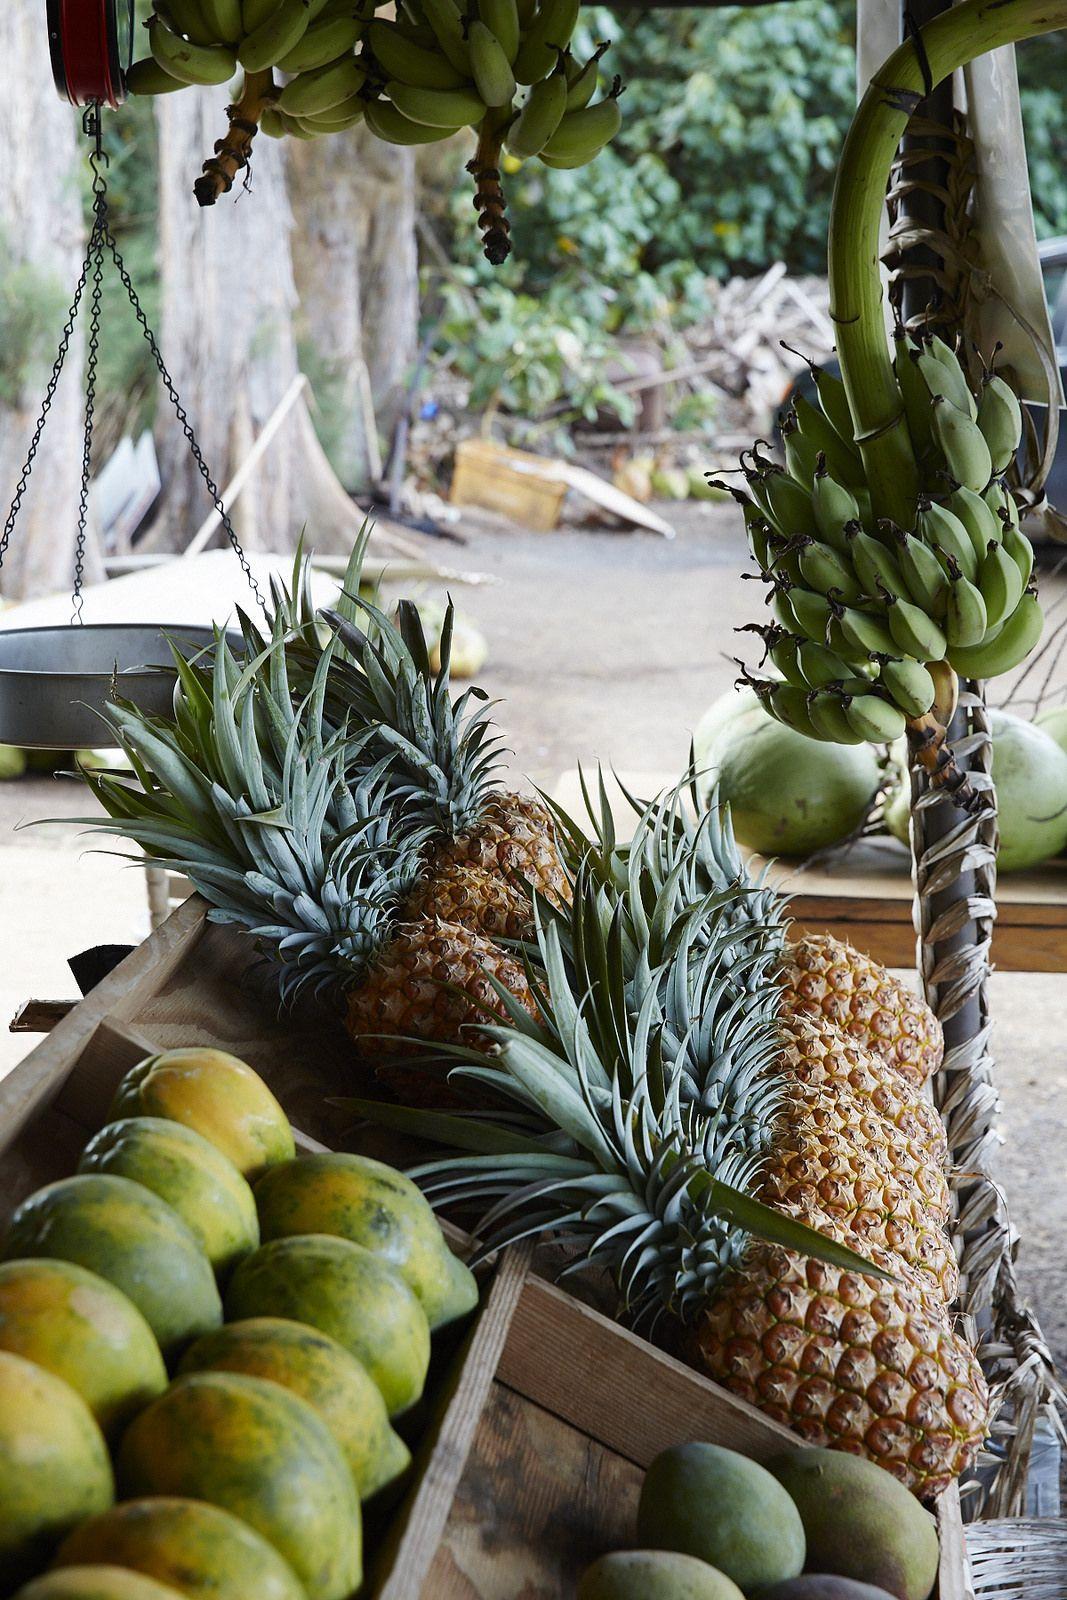 tropical island fruits. | travel / well | Pinterest